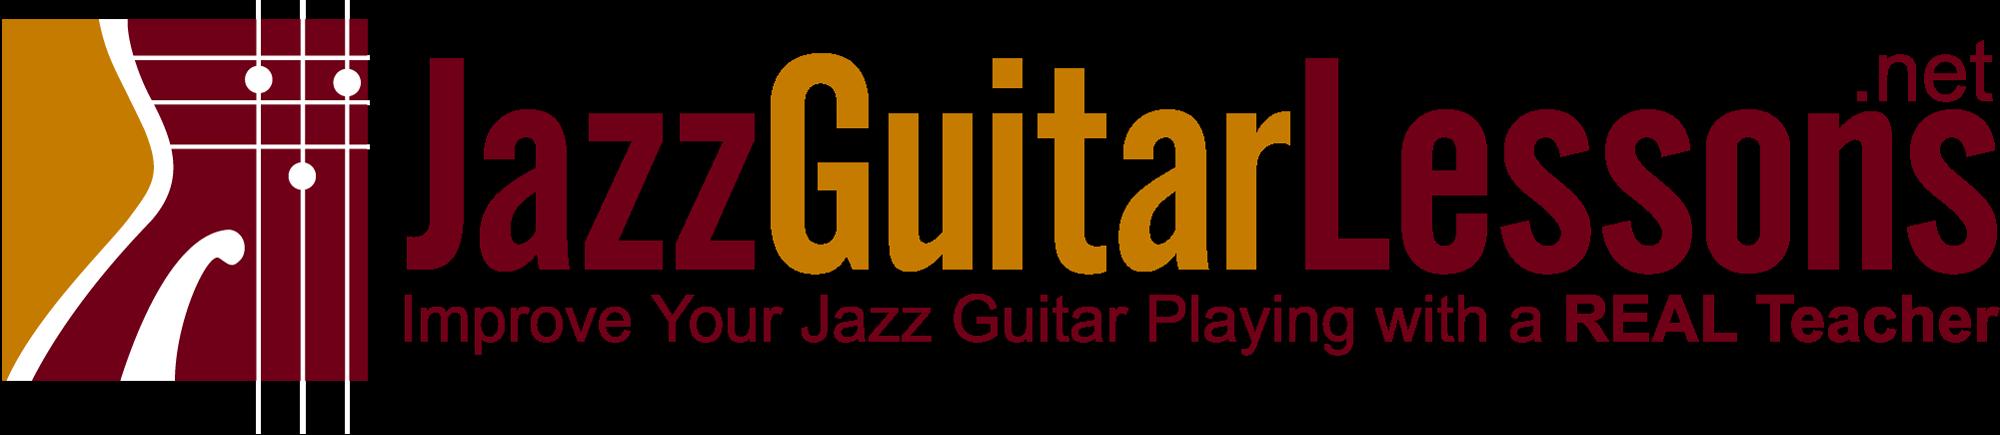 JazzGuitarLessons.net